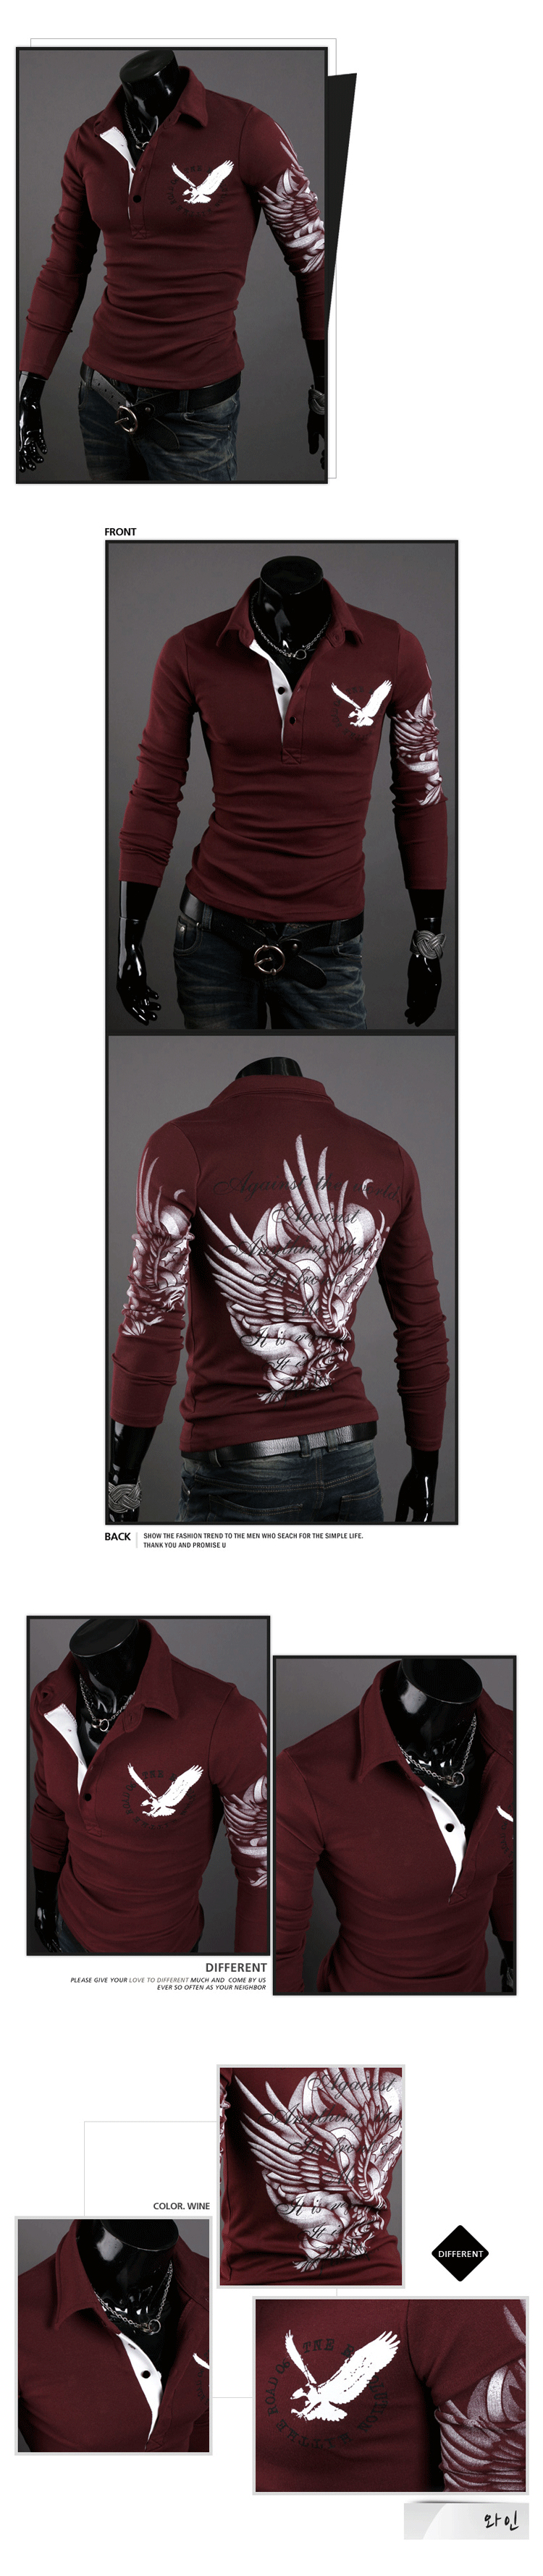 Comprar ahora. LUCKYFRIDAYF 2018 Lil Peep R.I.P. Camiseta de manga larga  para hombre mujer algodón primavera moda Casual Streetwear Hip Hop Camiseta  larga b06955289d3